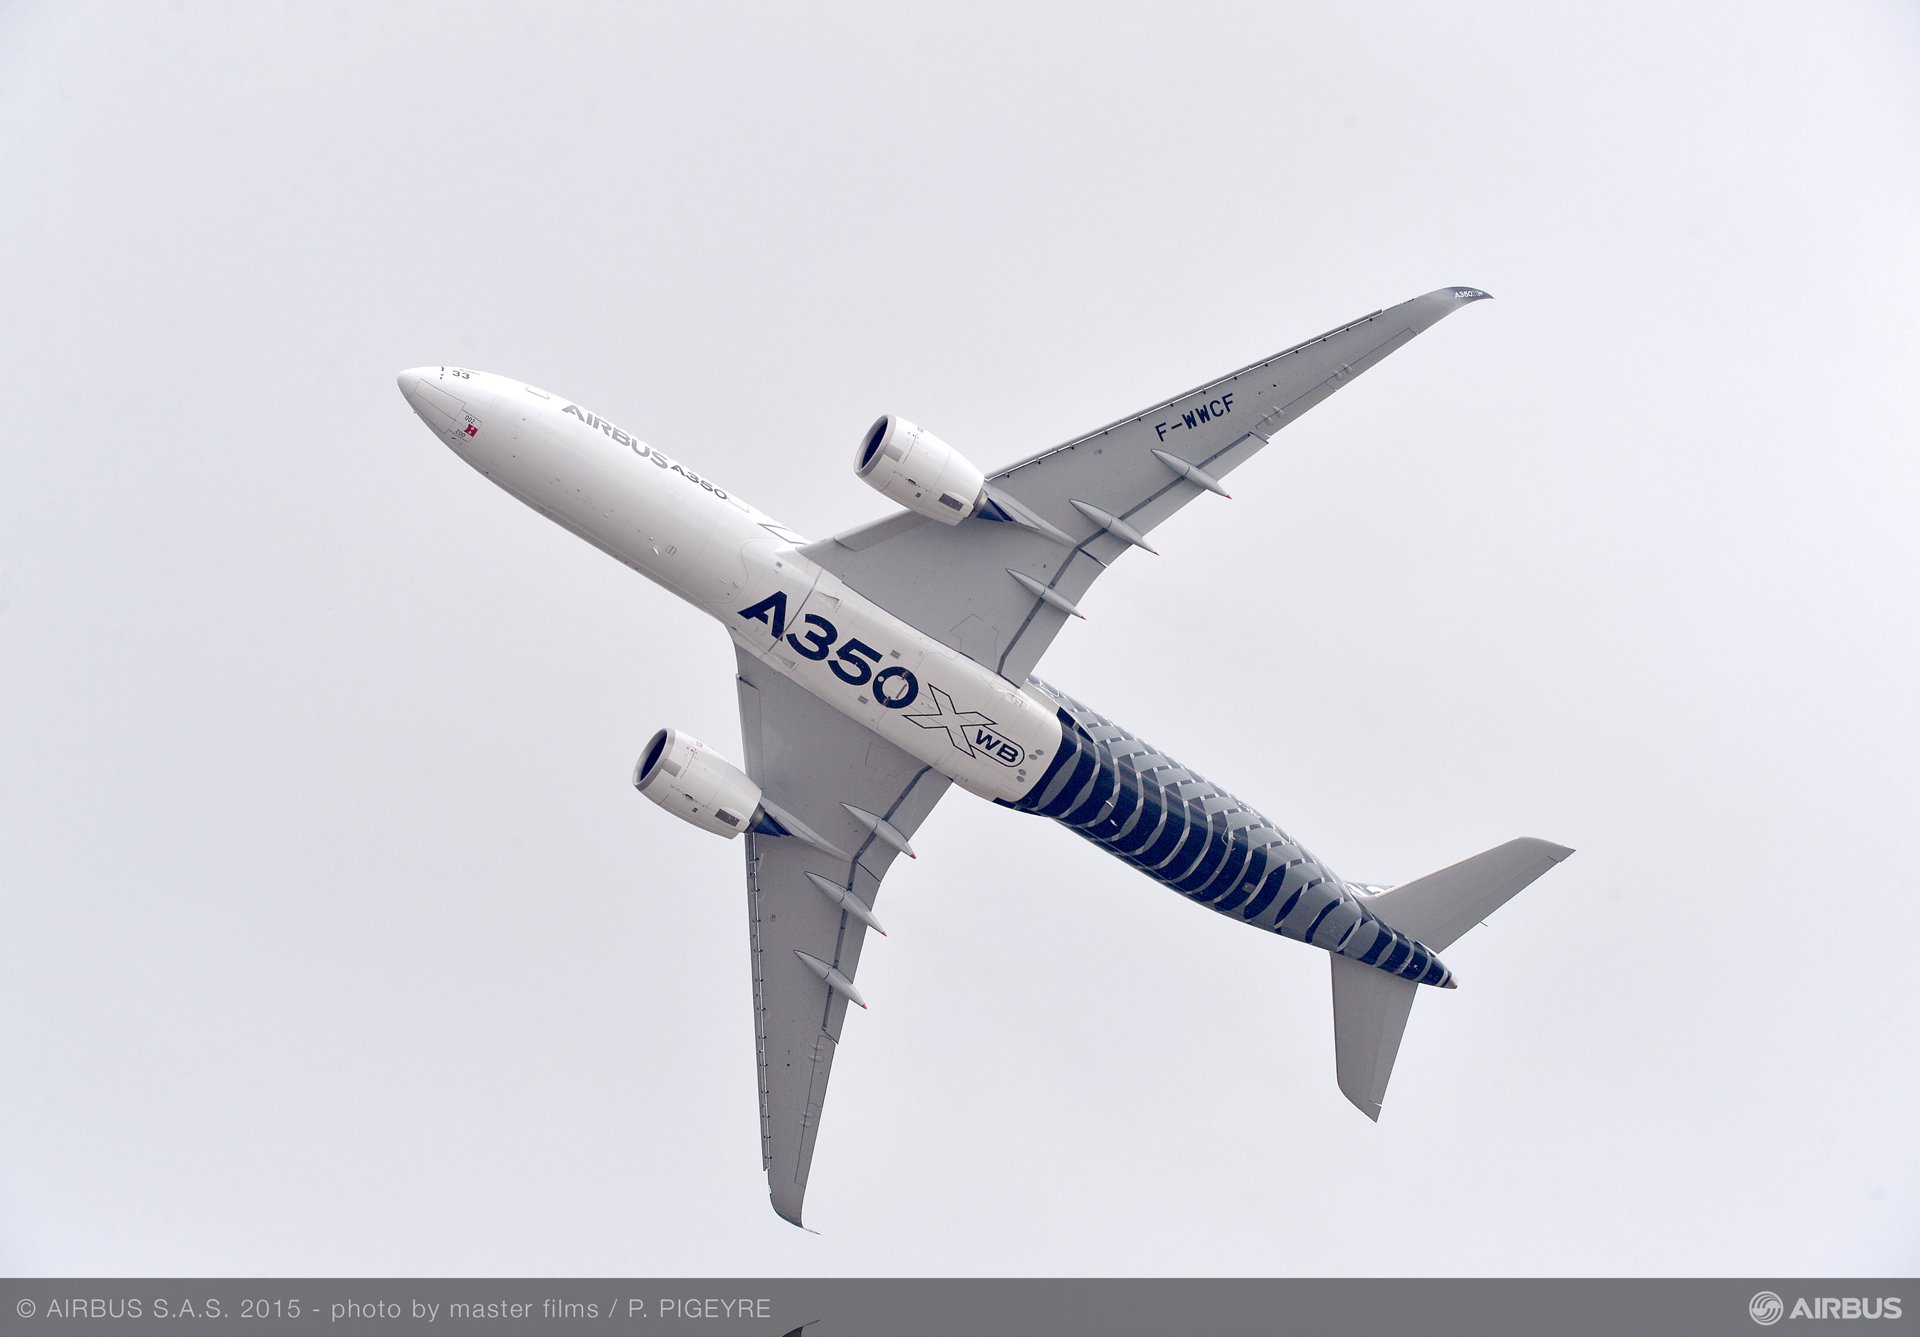 Paris Air Show 2015_A350 XWB opening demo flight 2